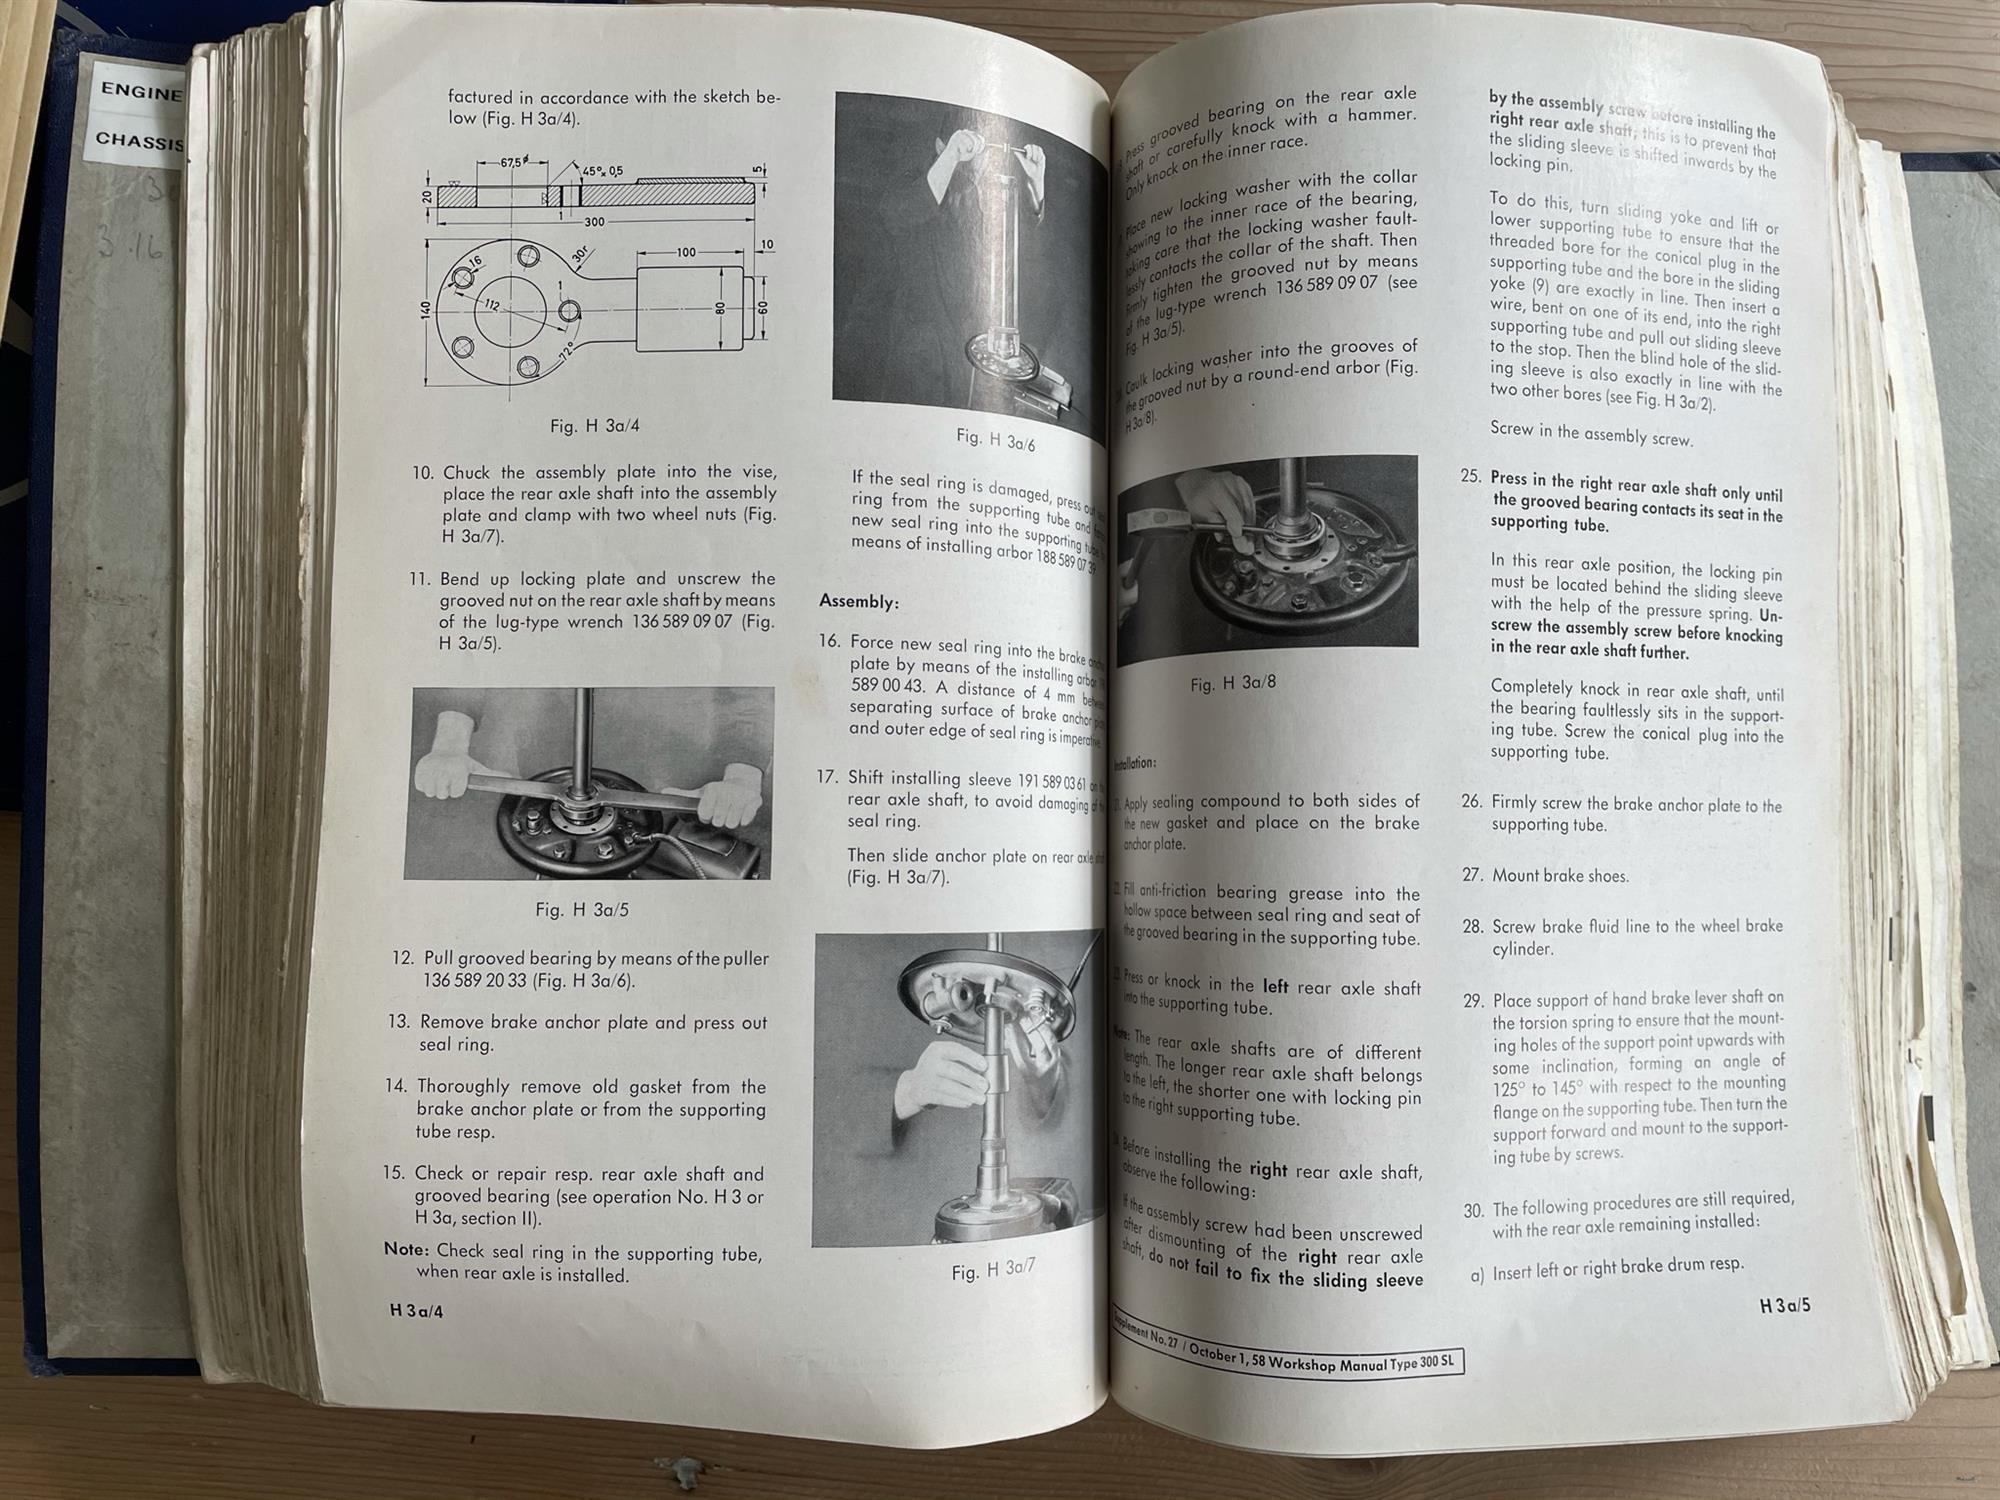 Very Rare Mercedes-Benz 300 SL Manuals etc - Image 3 of 7